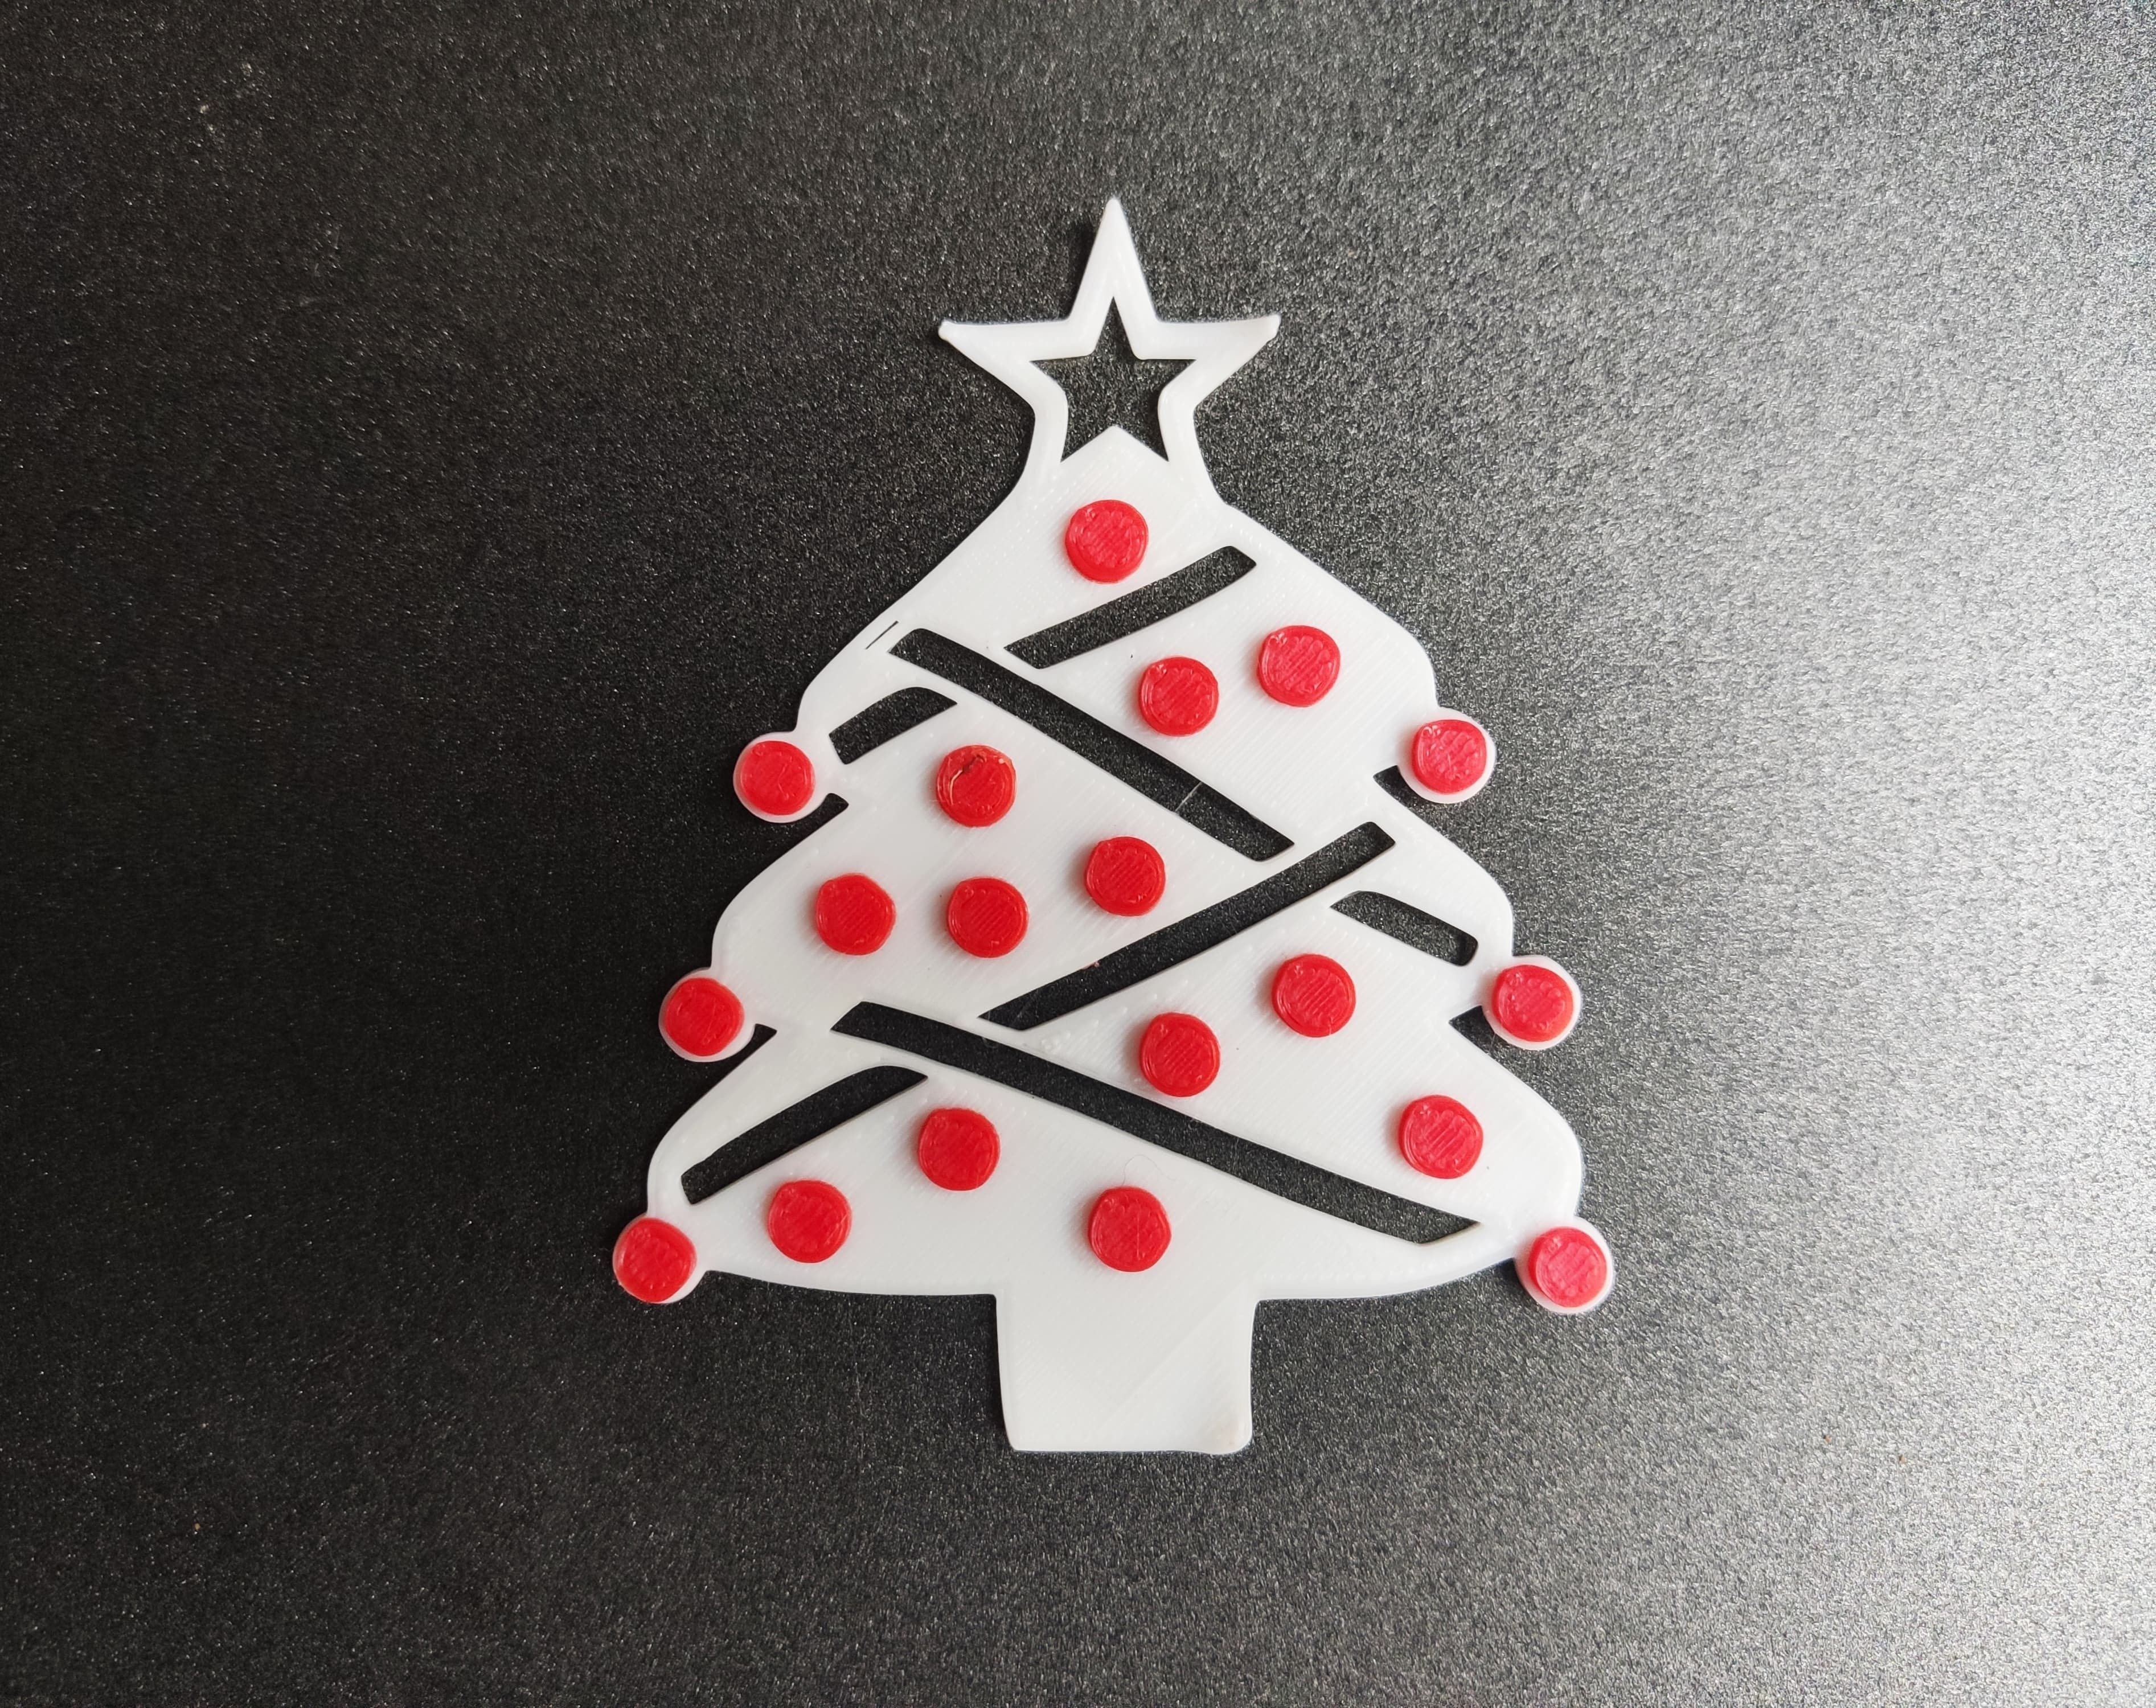 76781350_473103876642792_1483511884773588992_n.jpg Download free STL file Christmas tree ornament • 3D printer design, motek